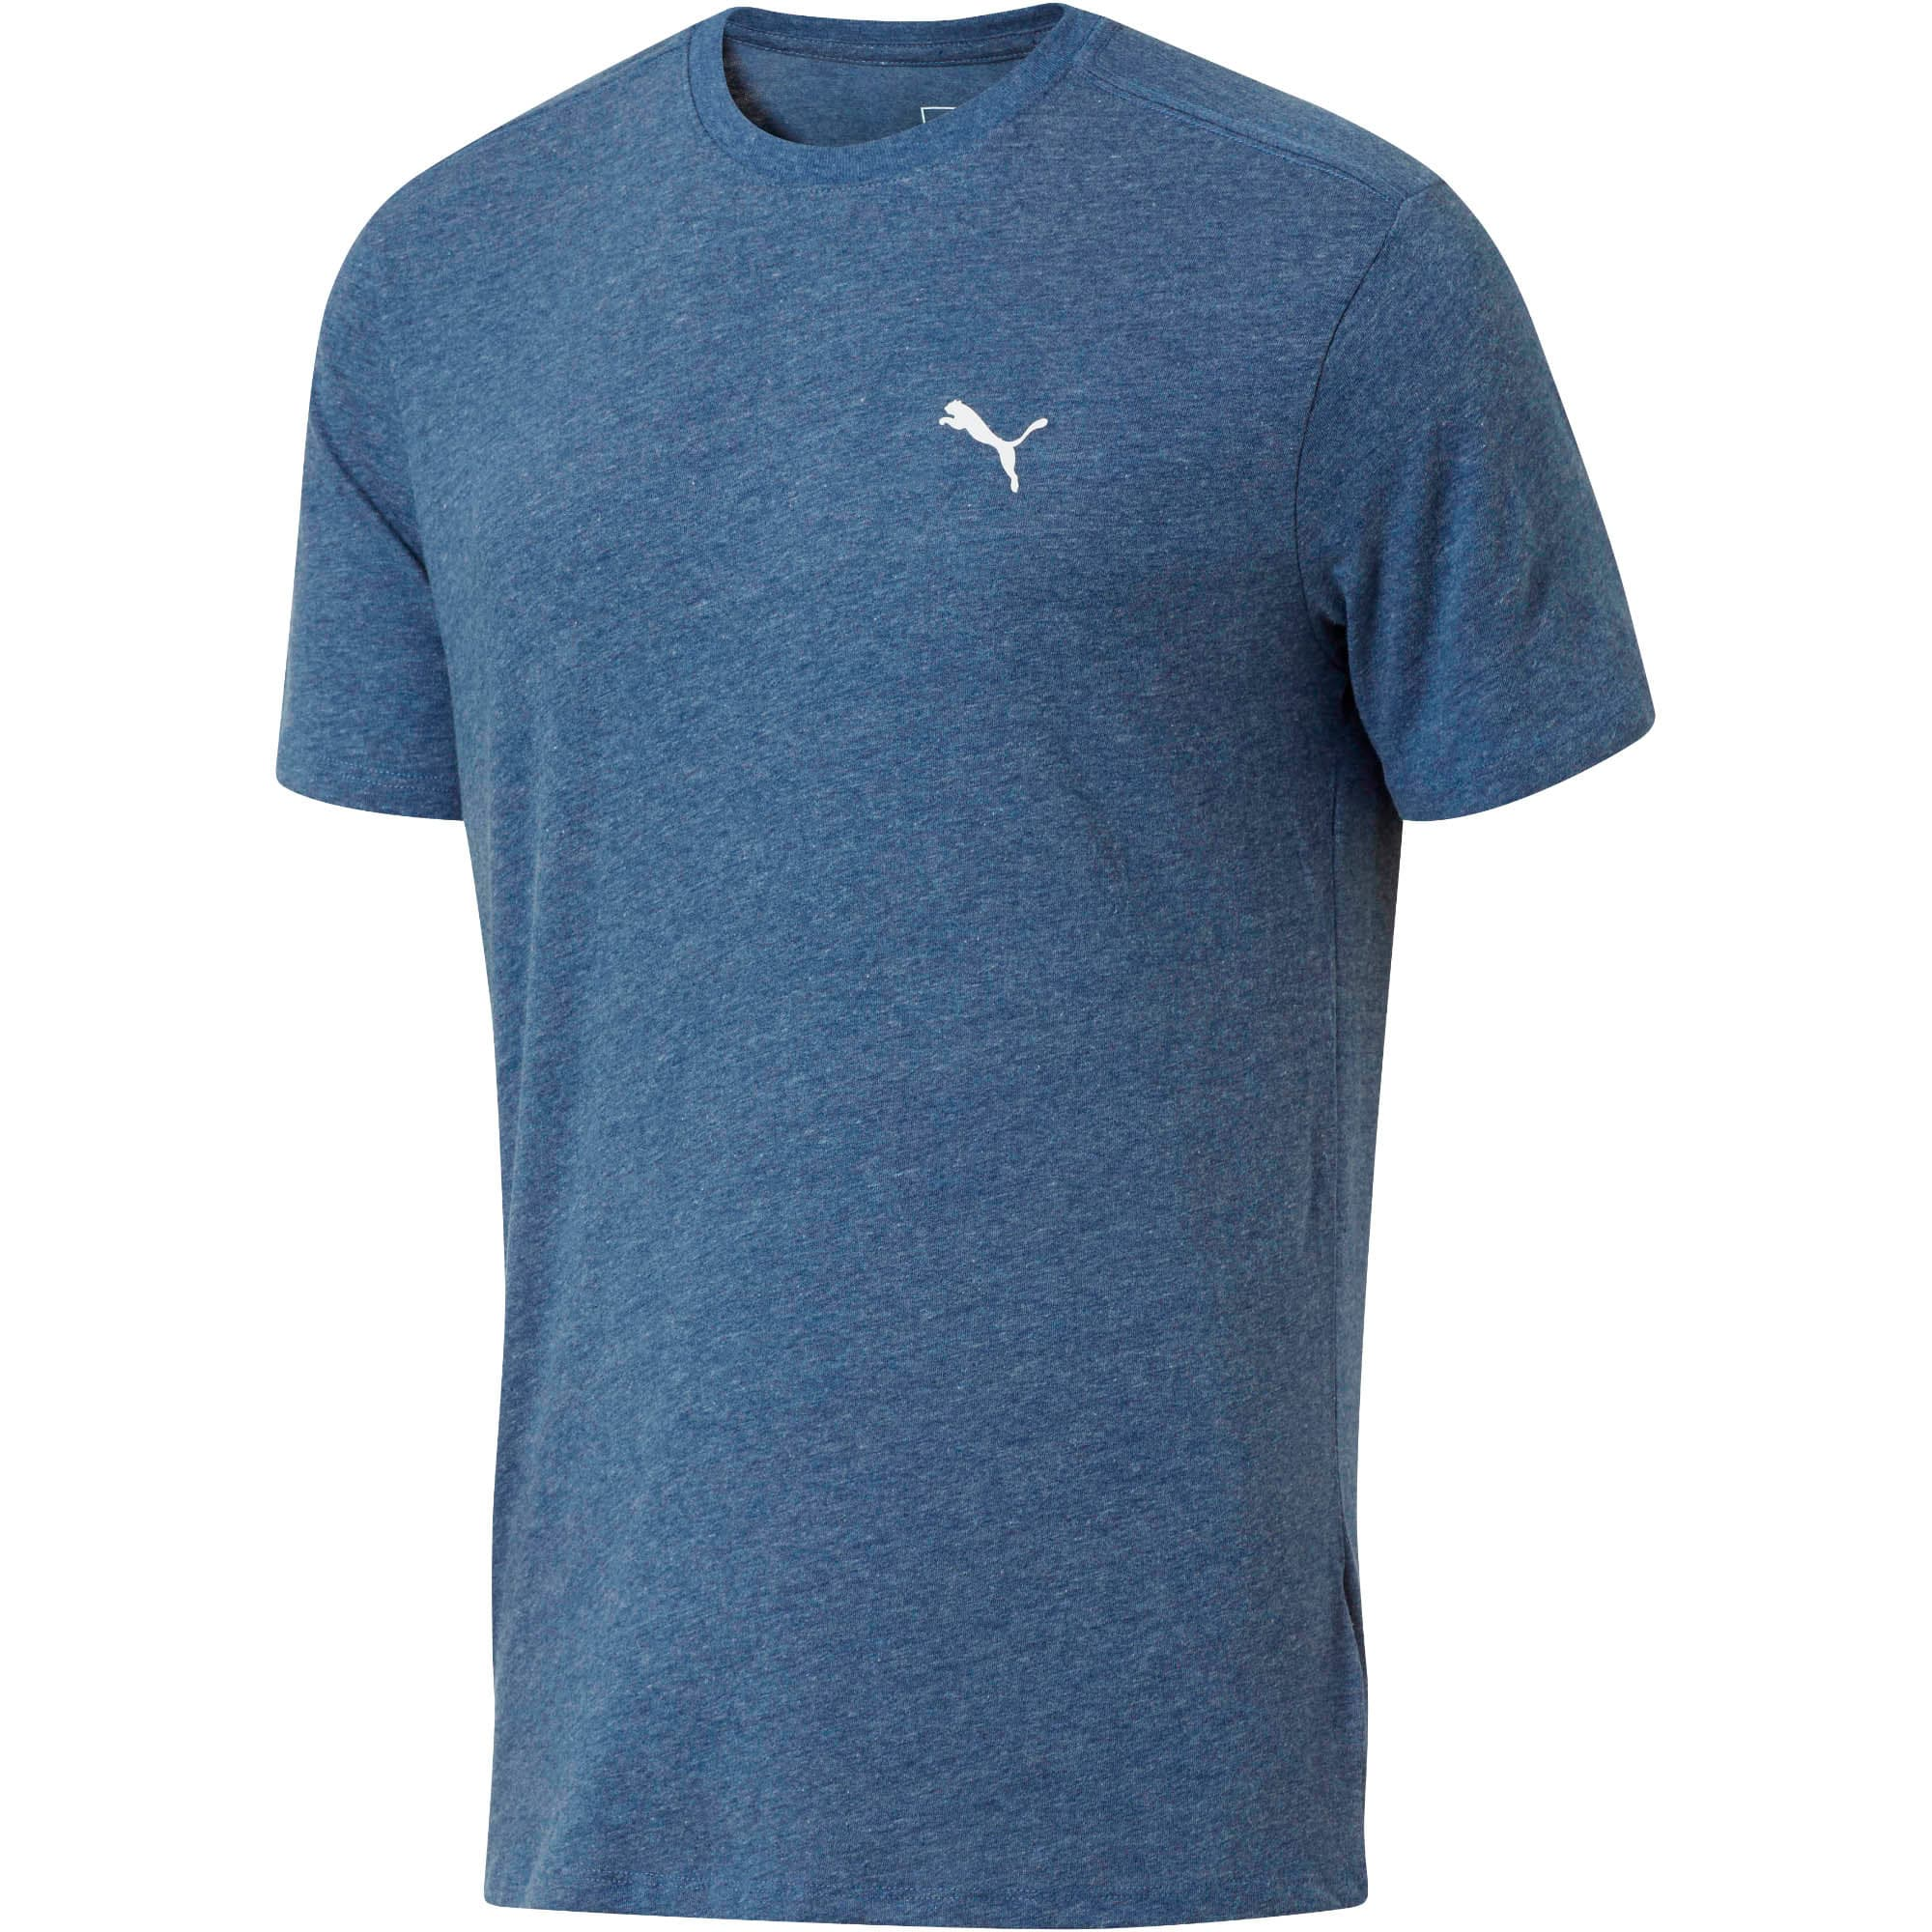 Thumbnail 1 of Essential Short Sleeve Crew T-Shirt, Blue Depths Heather, medium